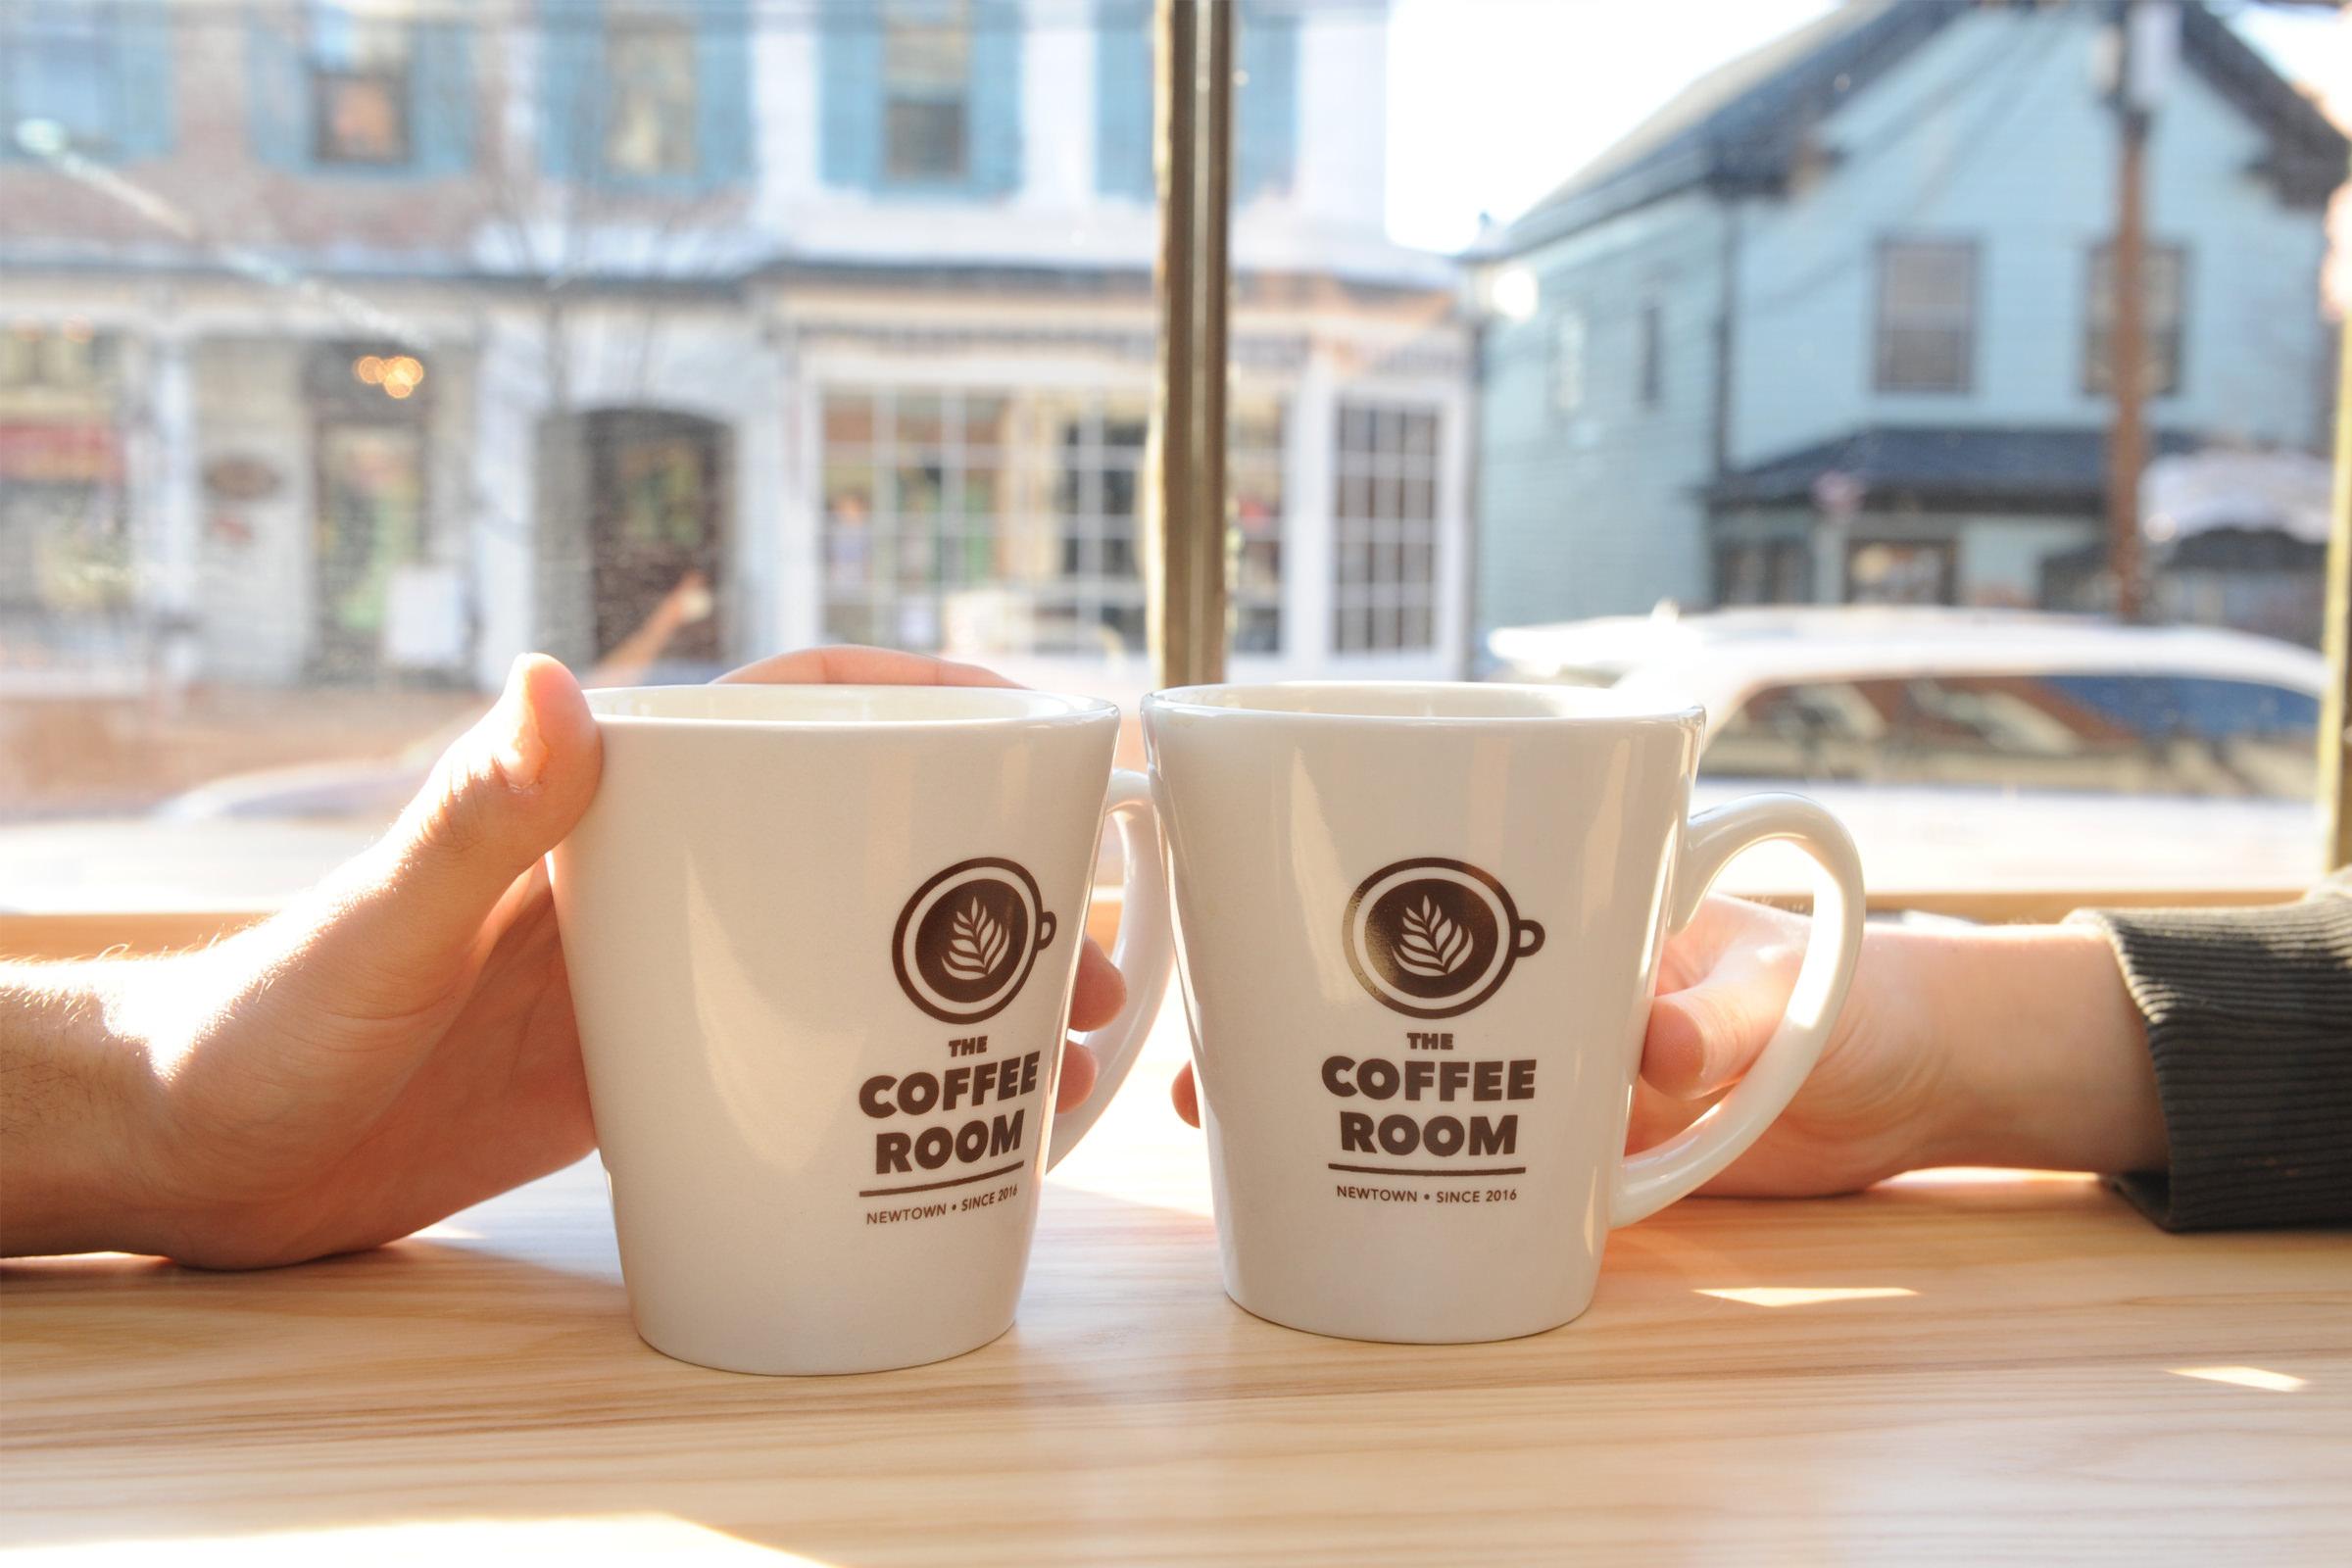 coffee_mugs_01.jpg